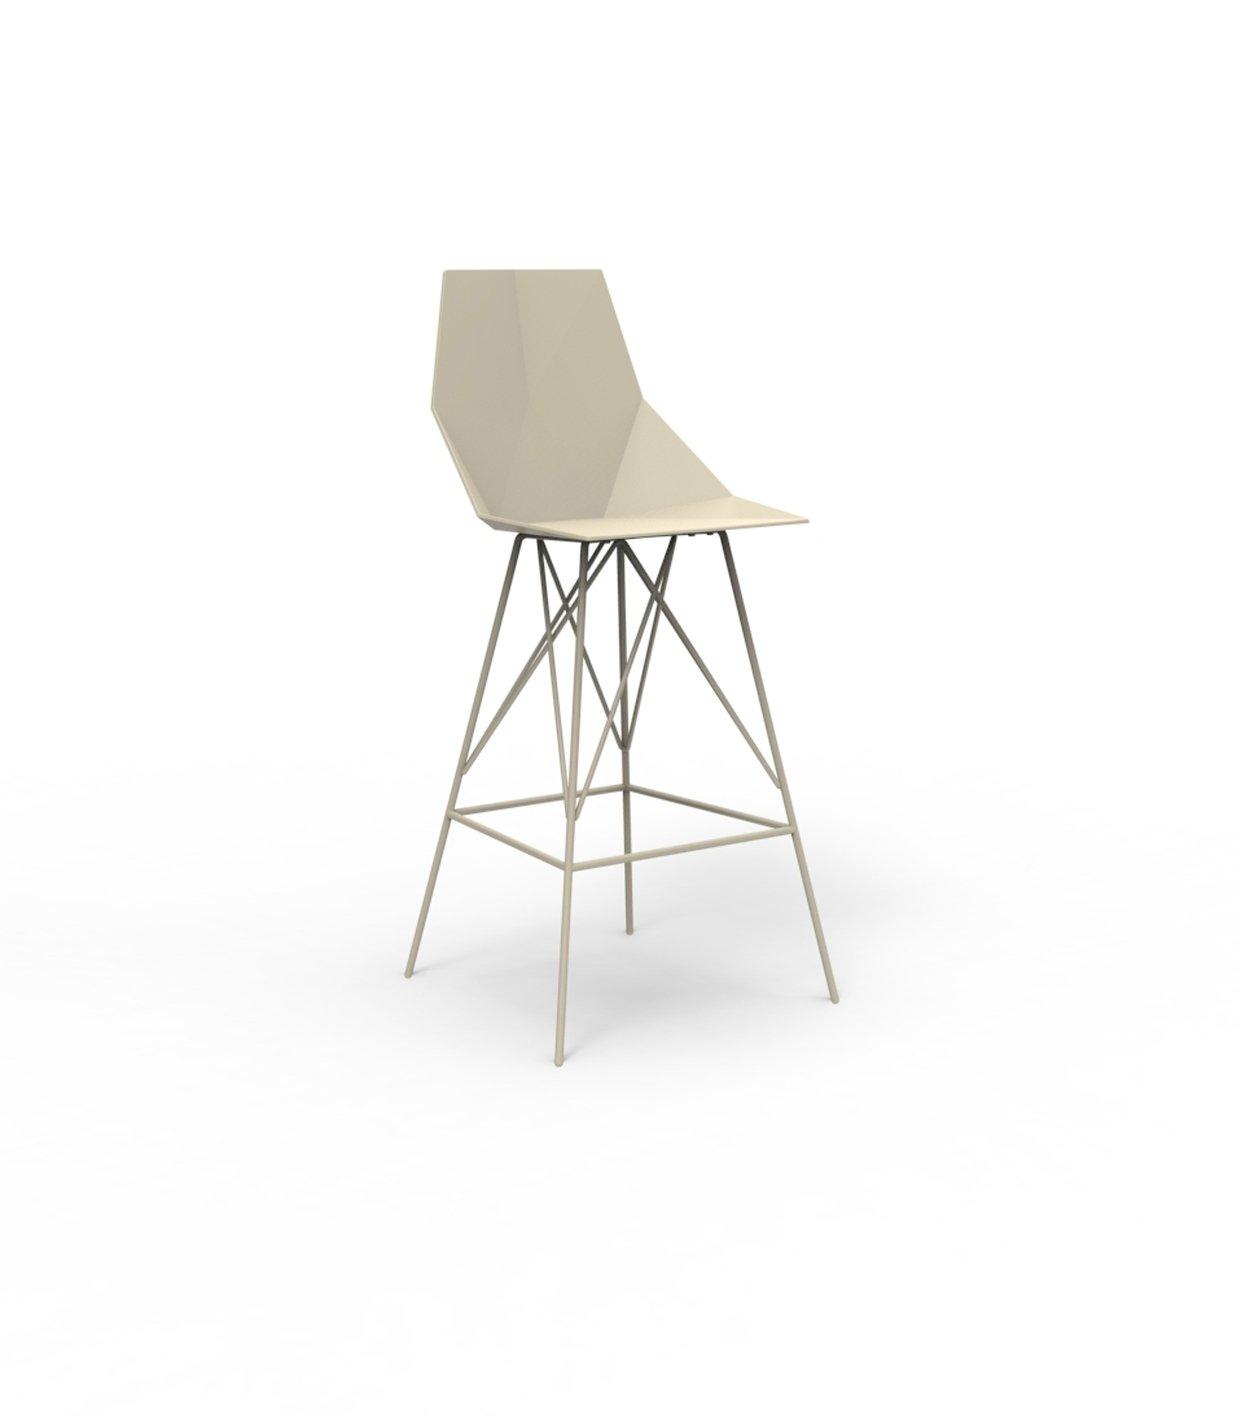 Vondom FAZ Barhocker - ecru - Höhe 111 cm - Ramón Esteve - Design - Barhocker - Gartenstuhl